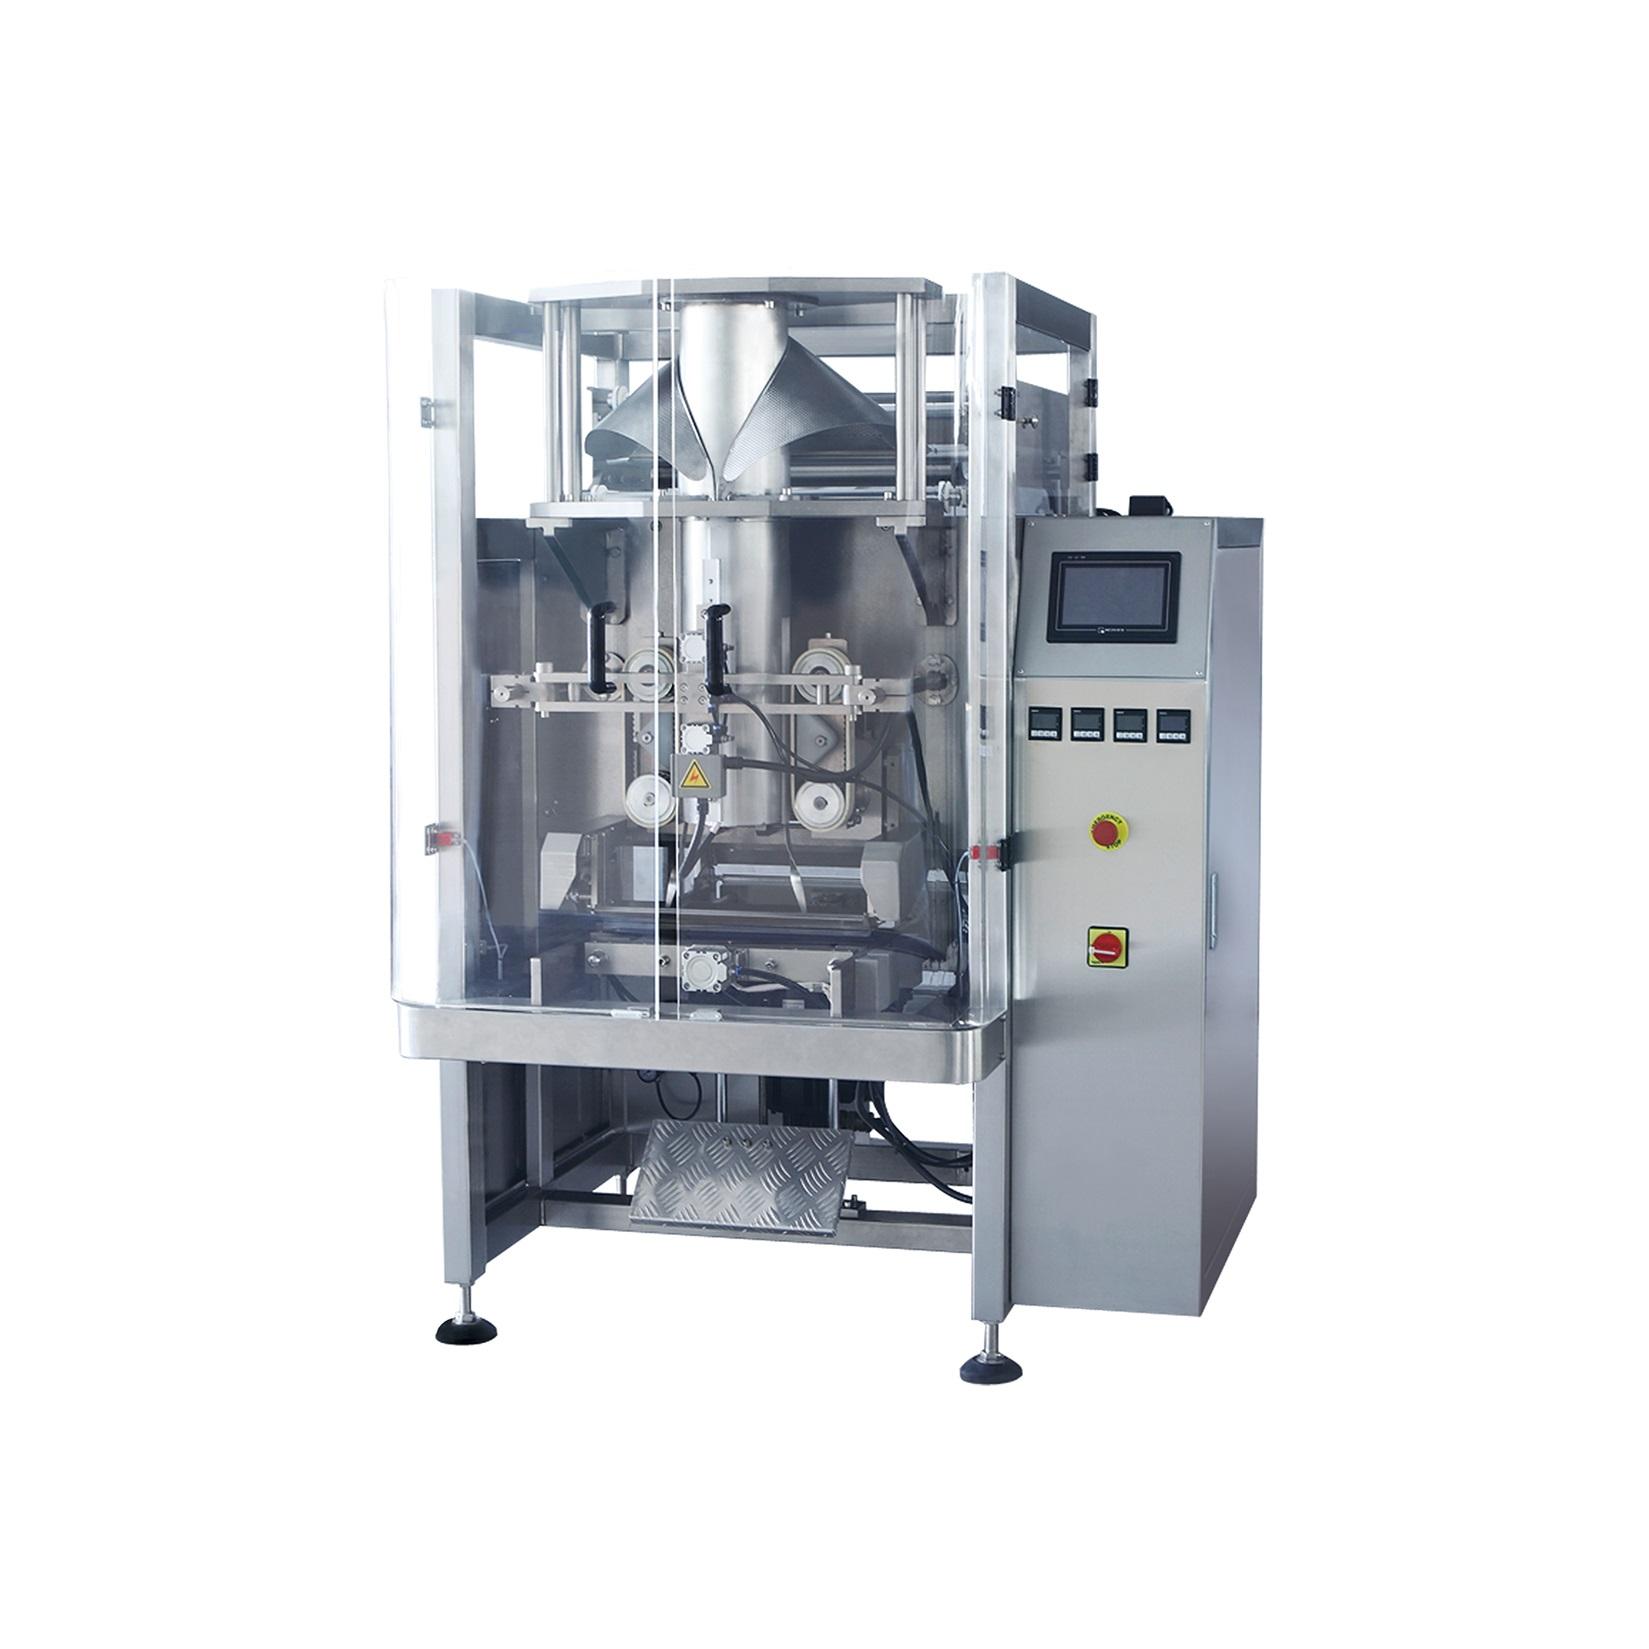 VFFS machine – V350